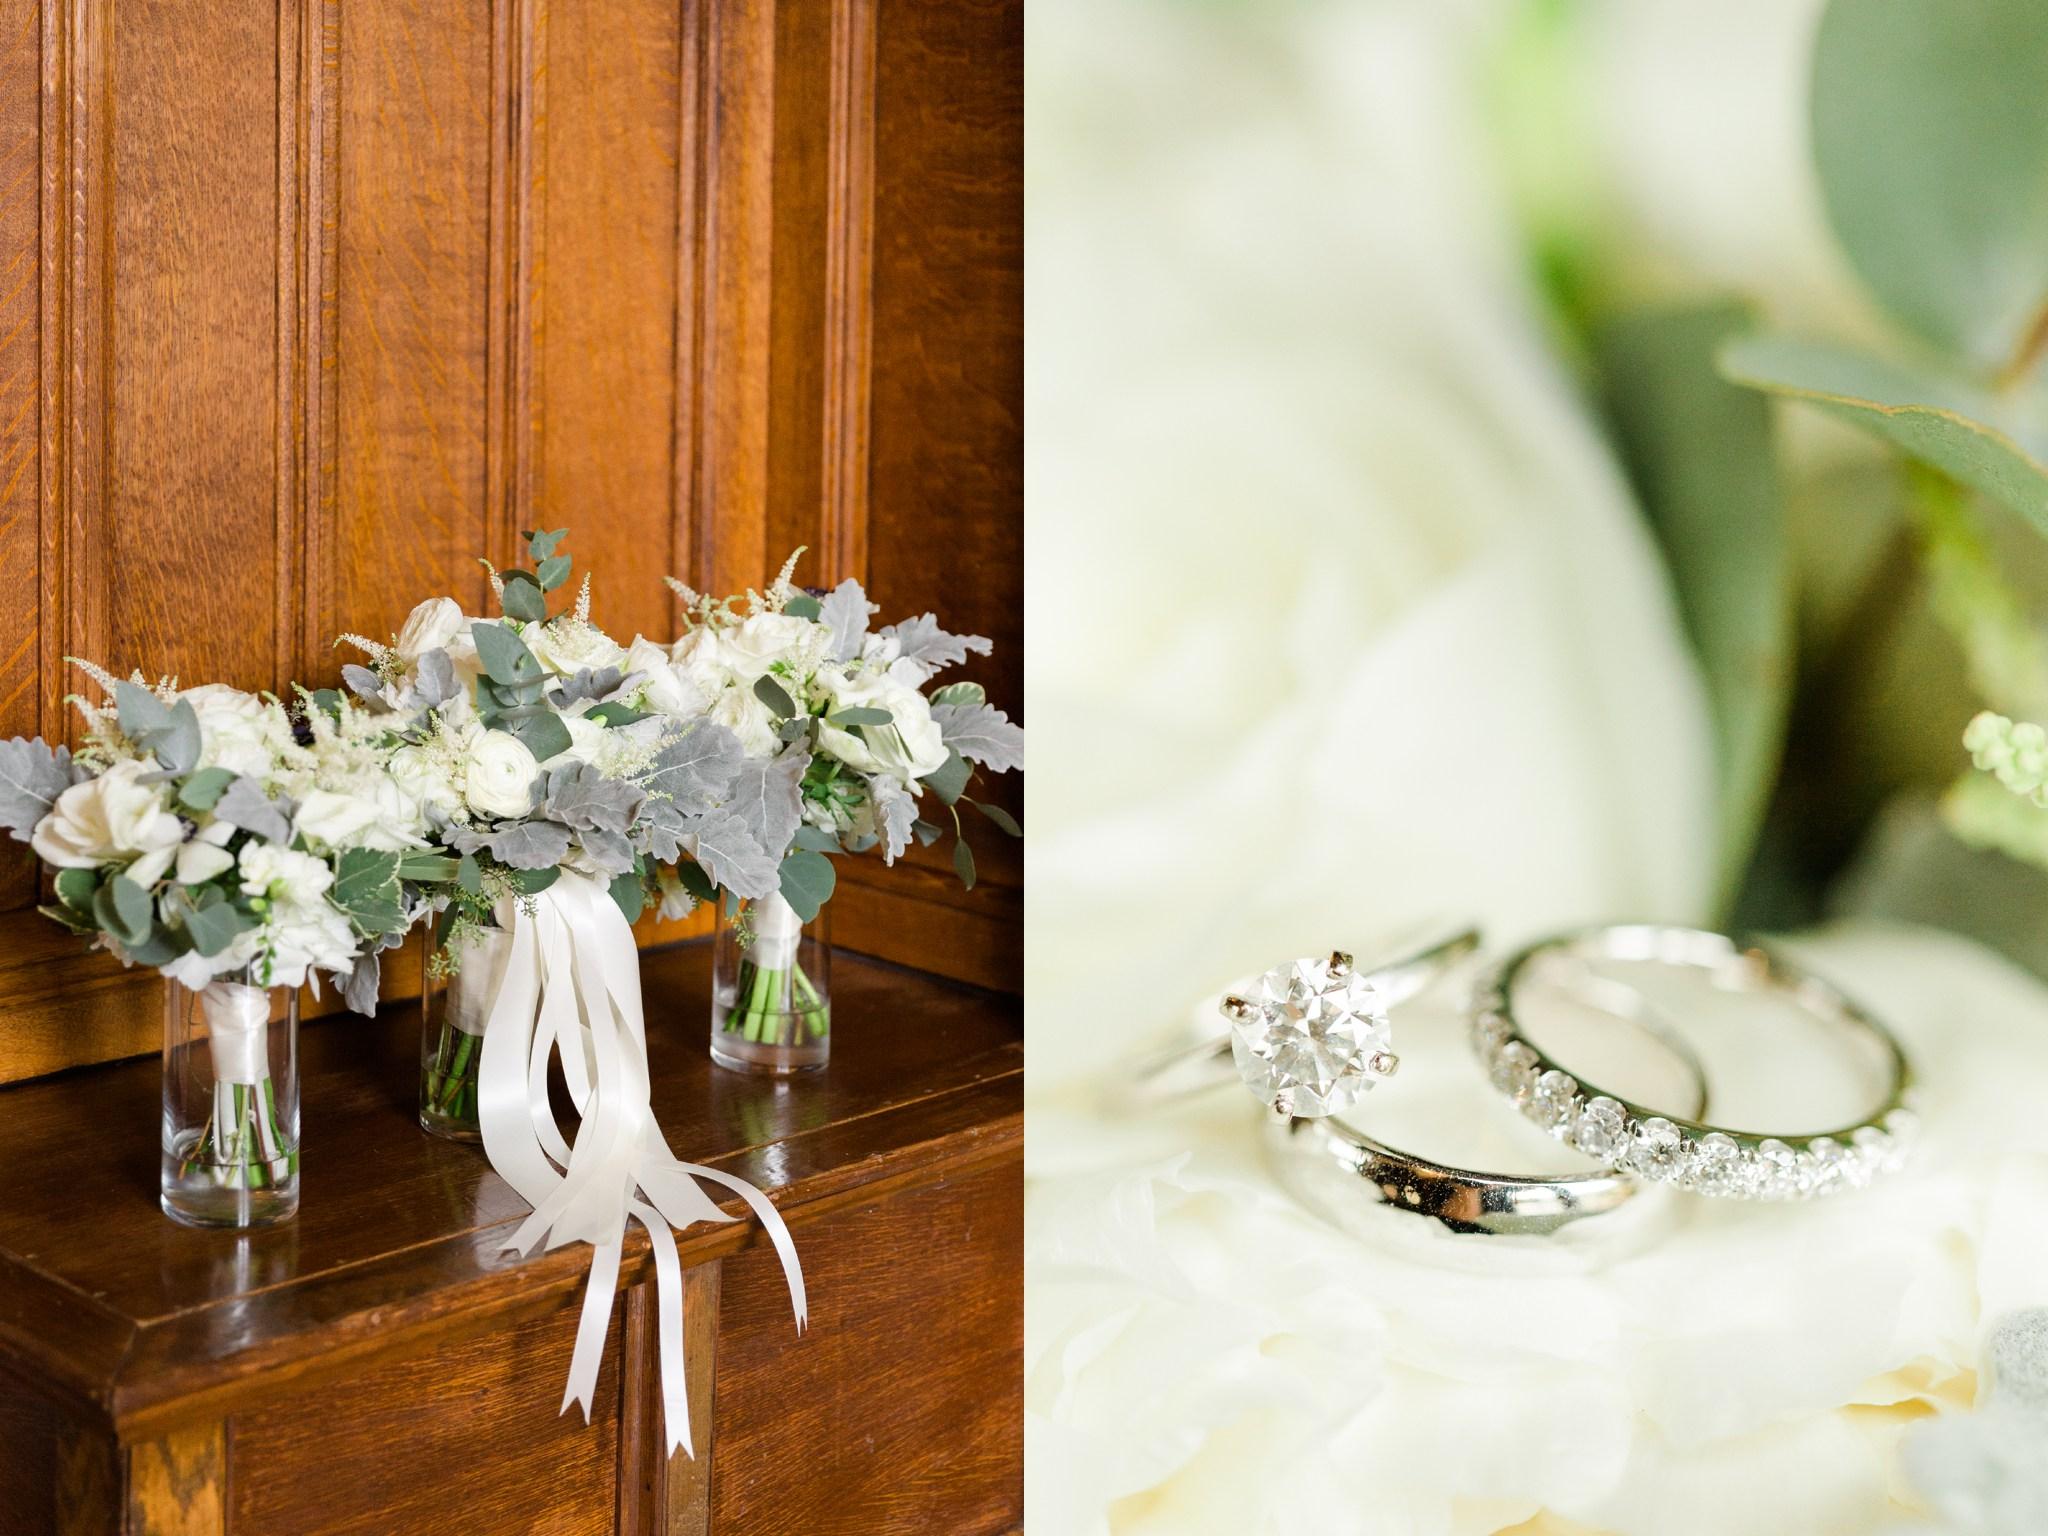 turner_hill_wedding_photos_00005.JPG